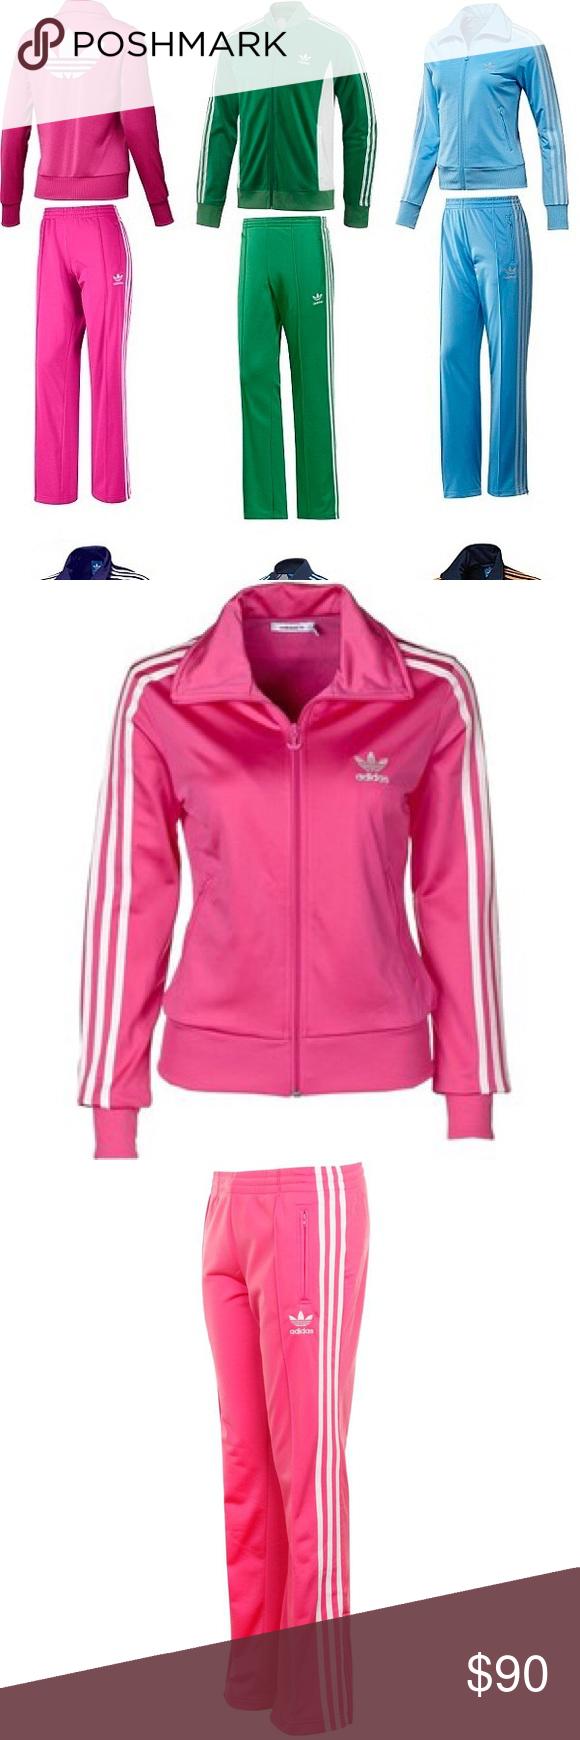 adidas sweatsuit Pink